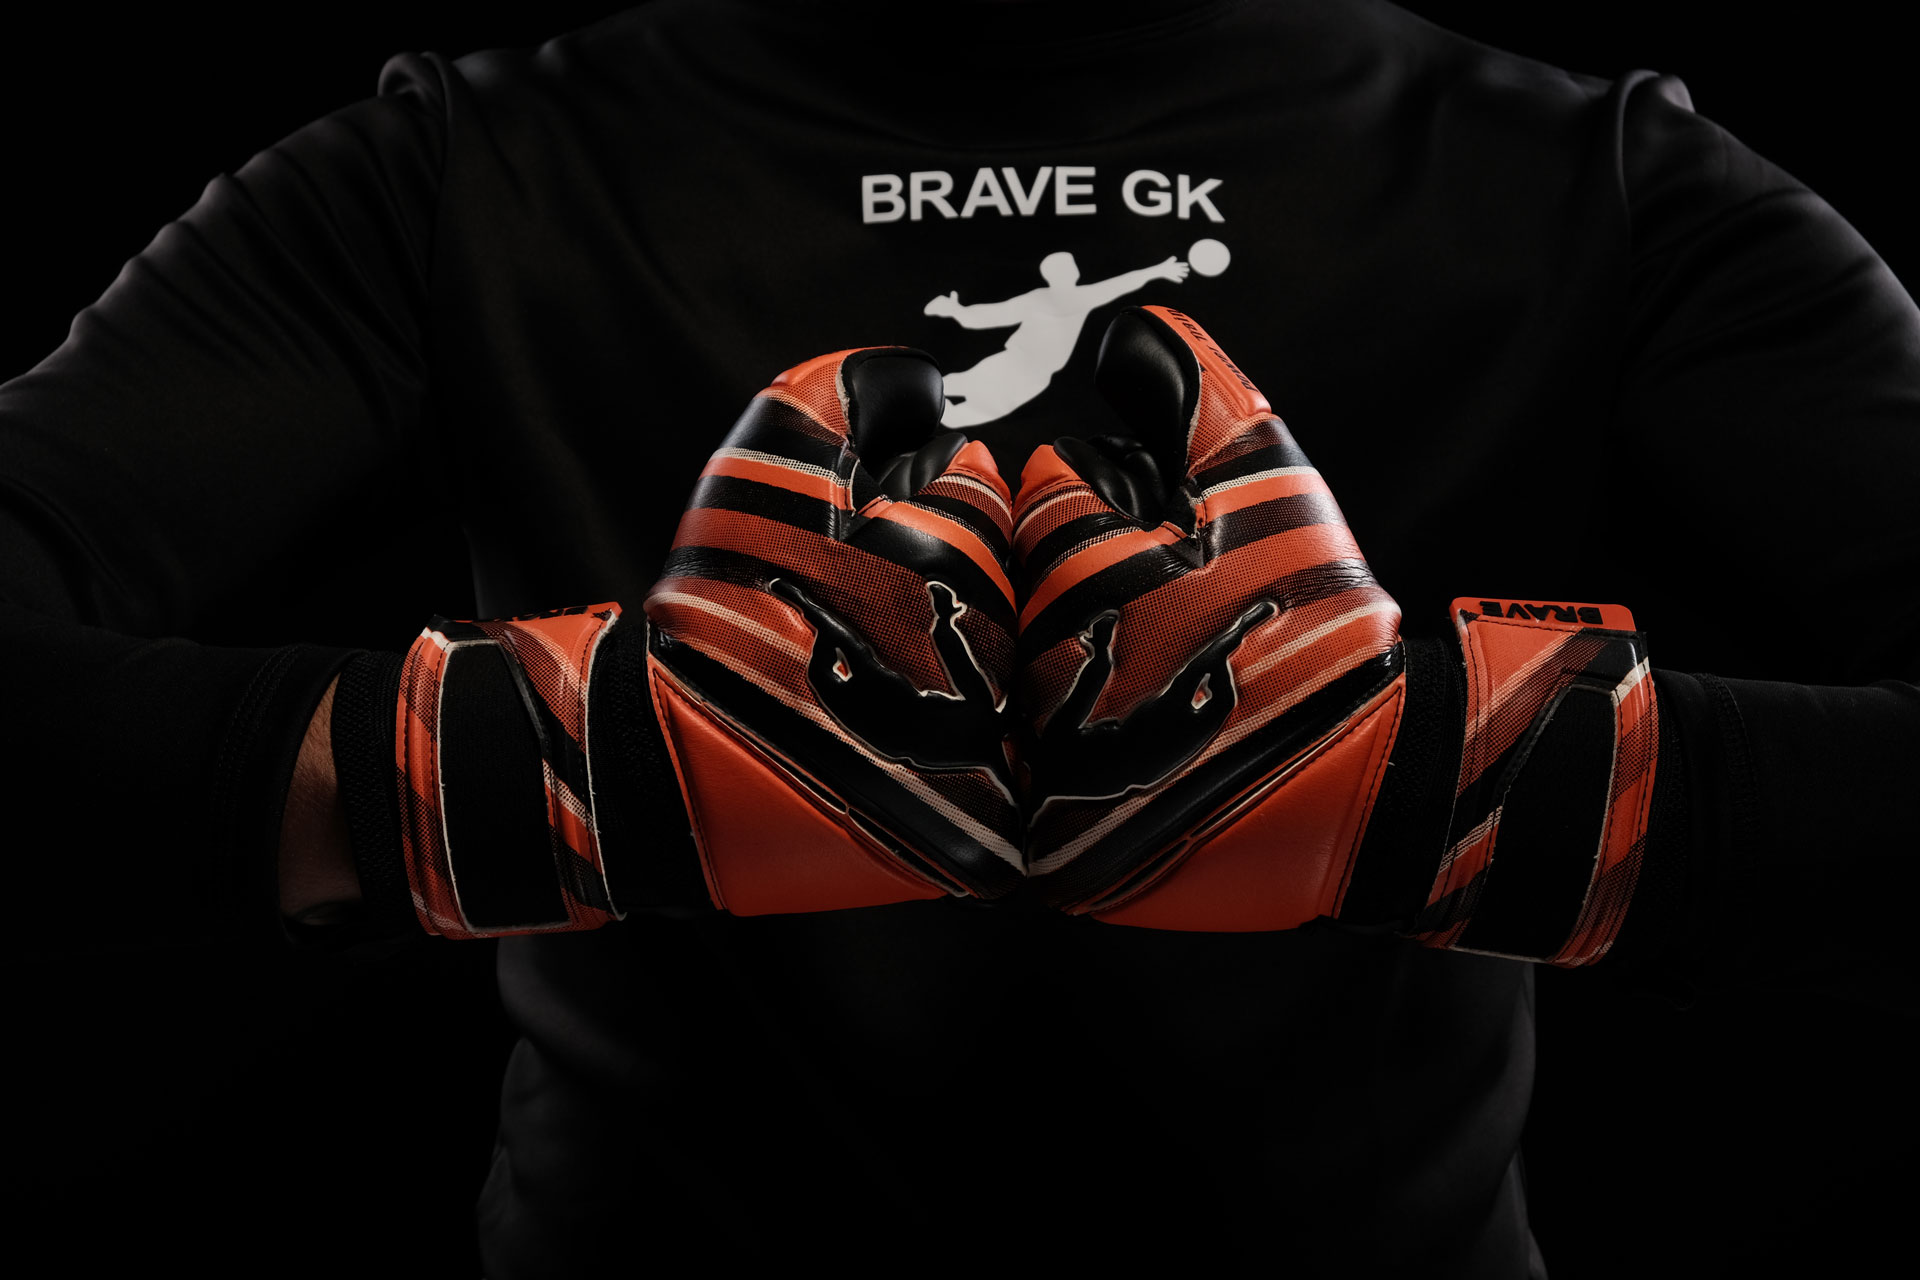 Вратарские перчатки Brave GK GK Power Train-официальный интернет-магазин Brave GK